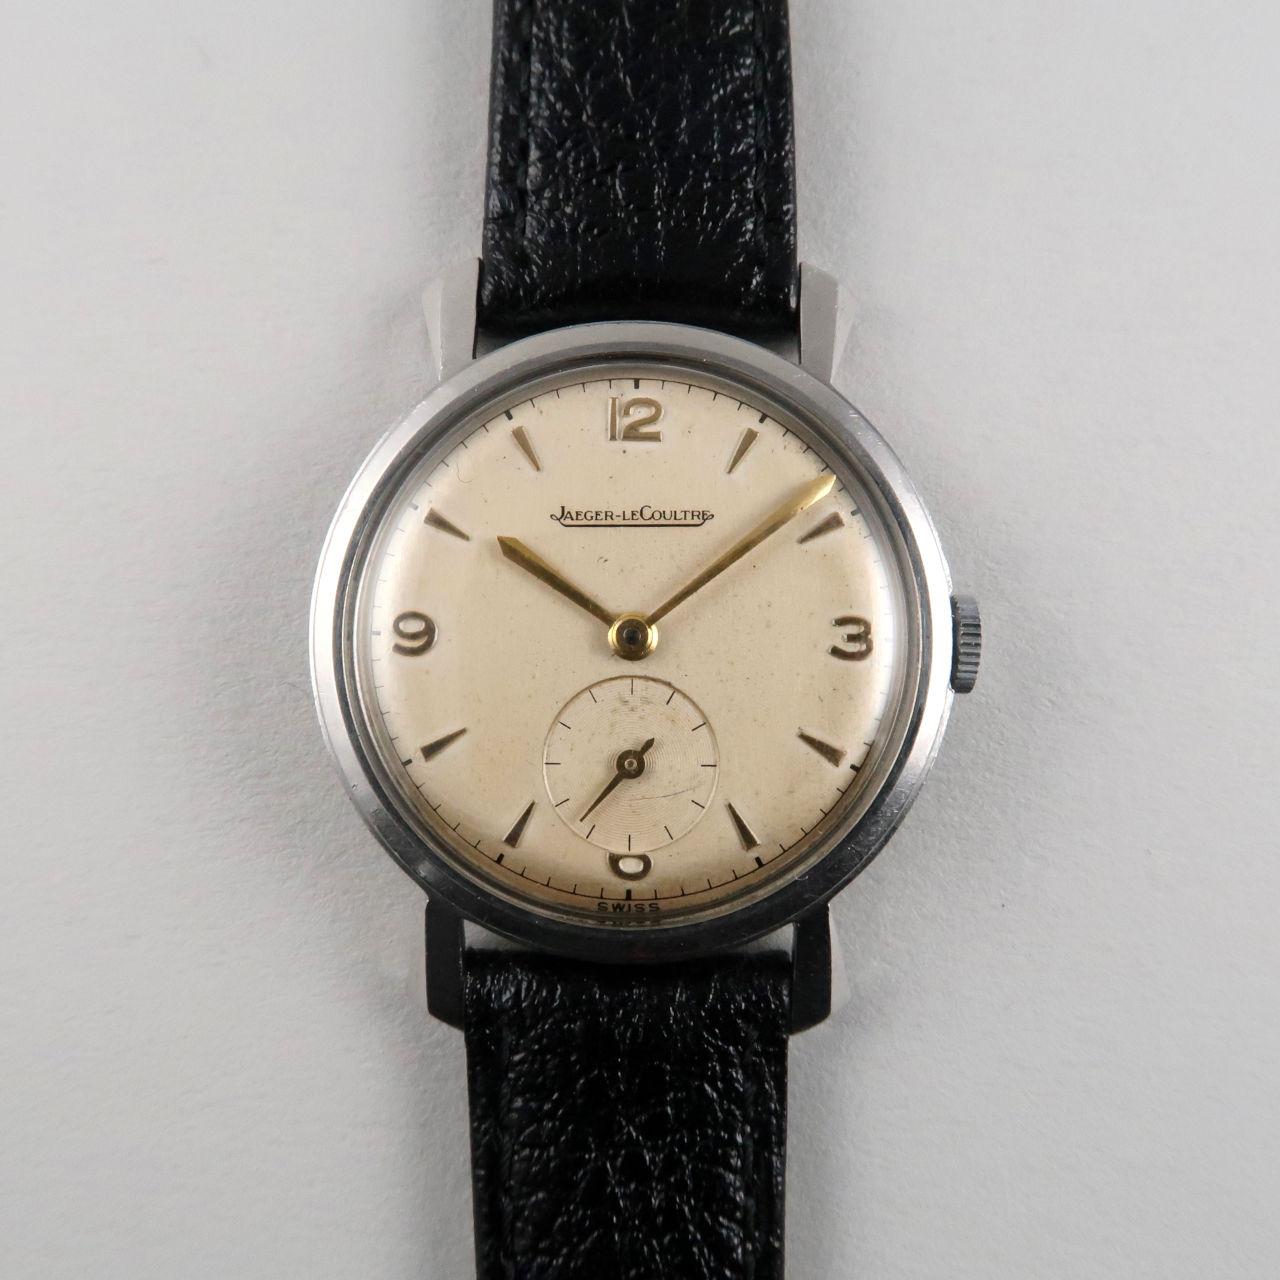 Jaeger-LeCoultre cal.P480 steel vintage wristwatch, circa 1954